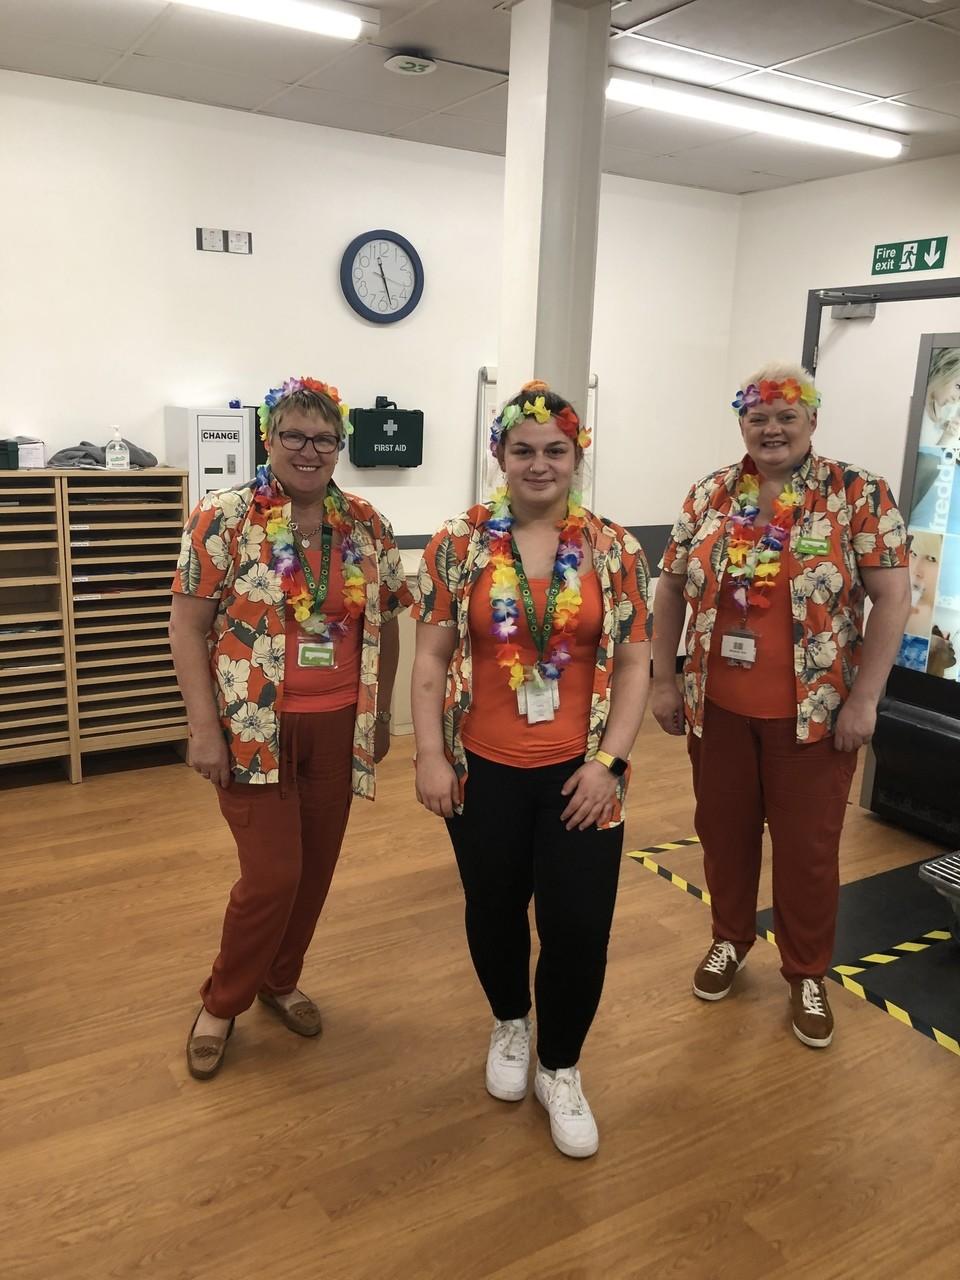 Triplets together again | Asda Portadown